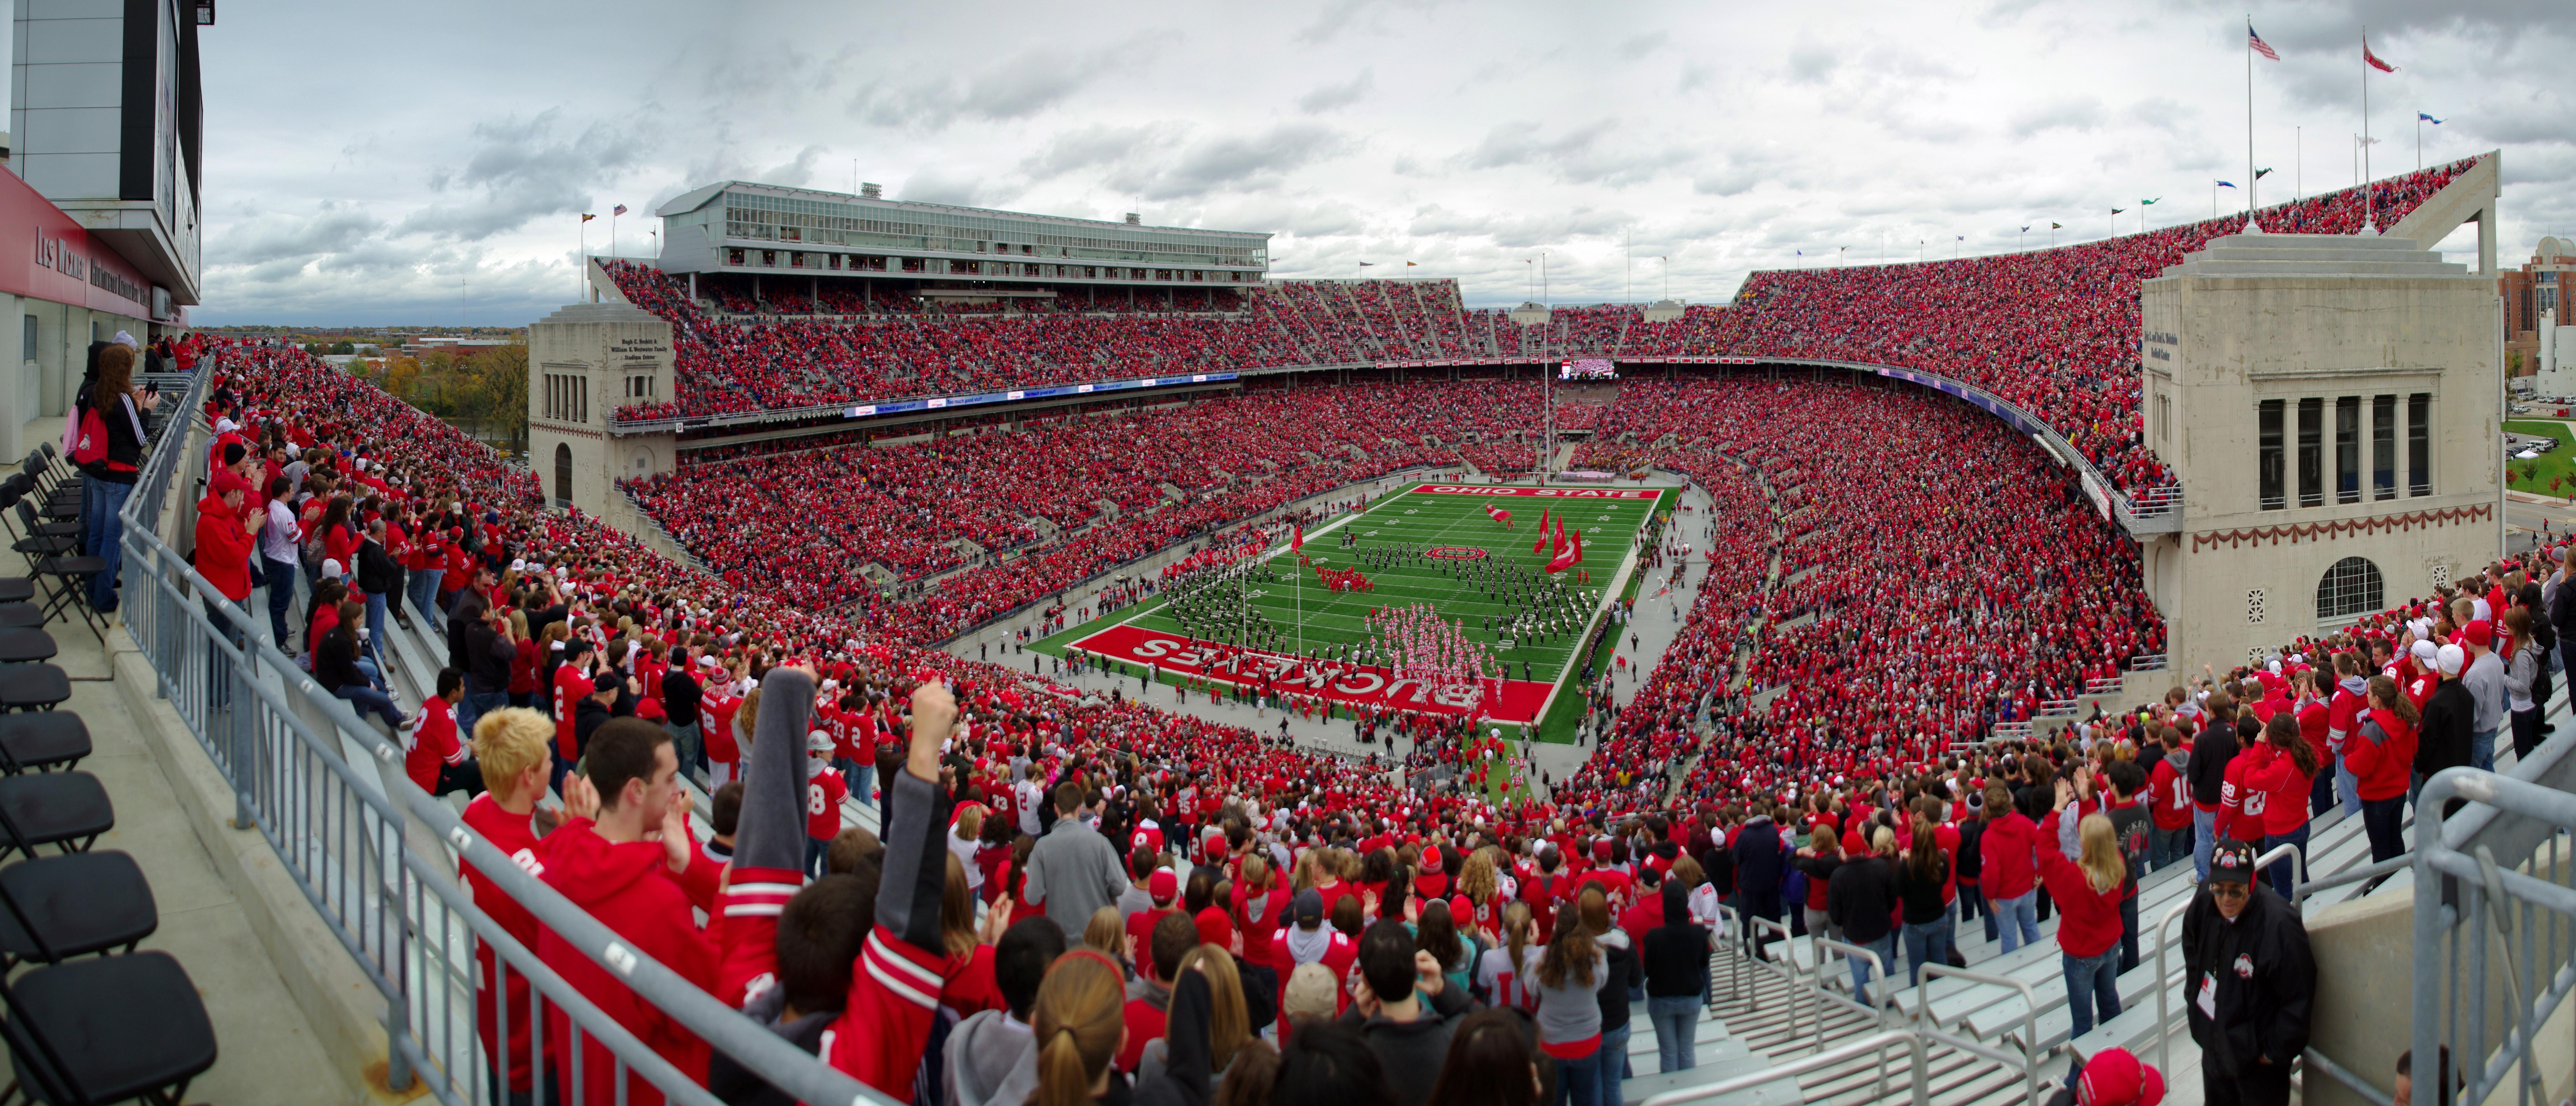 Ohio State Football Wallpaper >> Ohio Stadium Wallpaper - WallpaperSafari